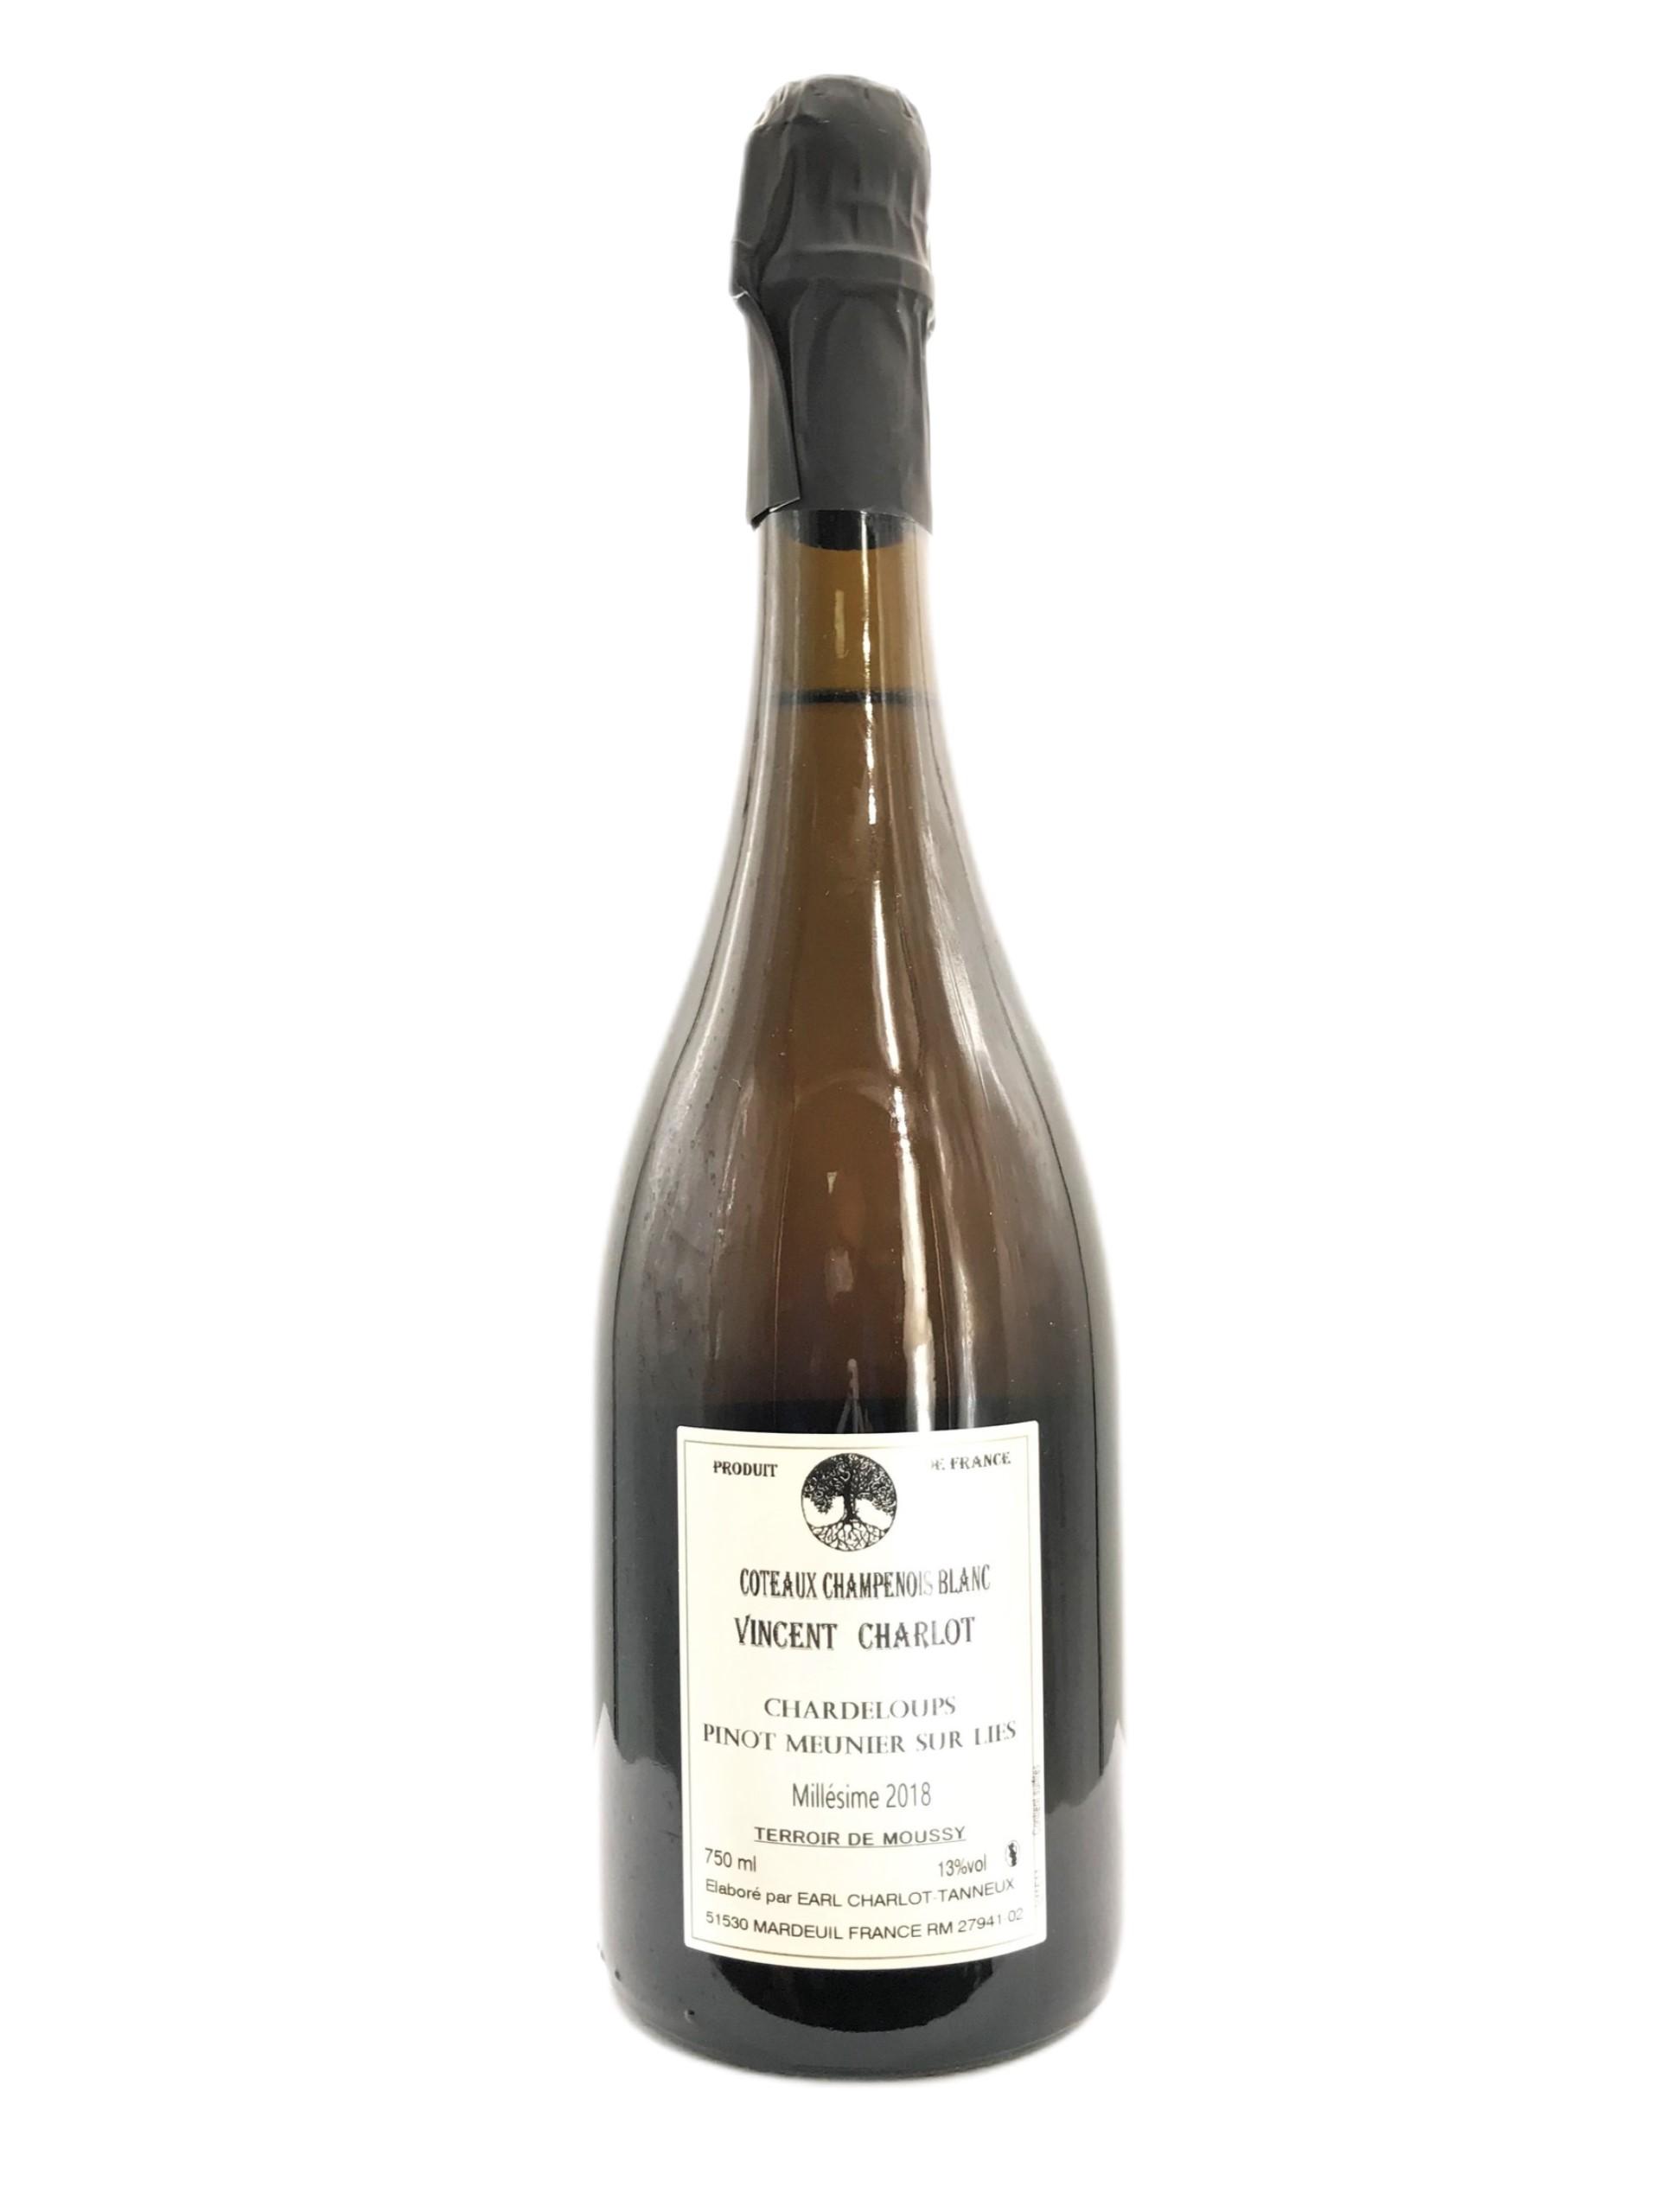 Charlot Tanneux Coteaux Champenois Blanc Chardeloups Pinot Meunier